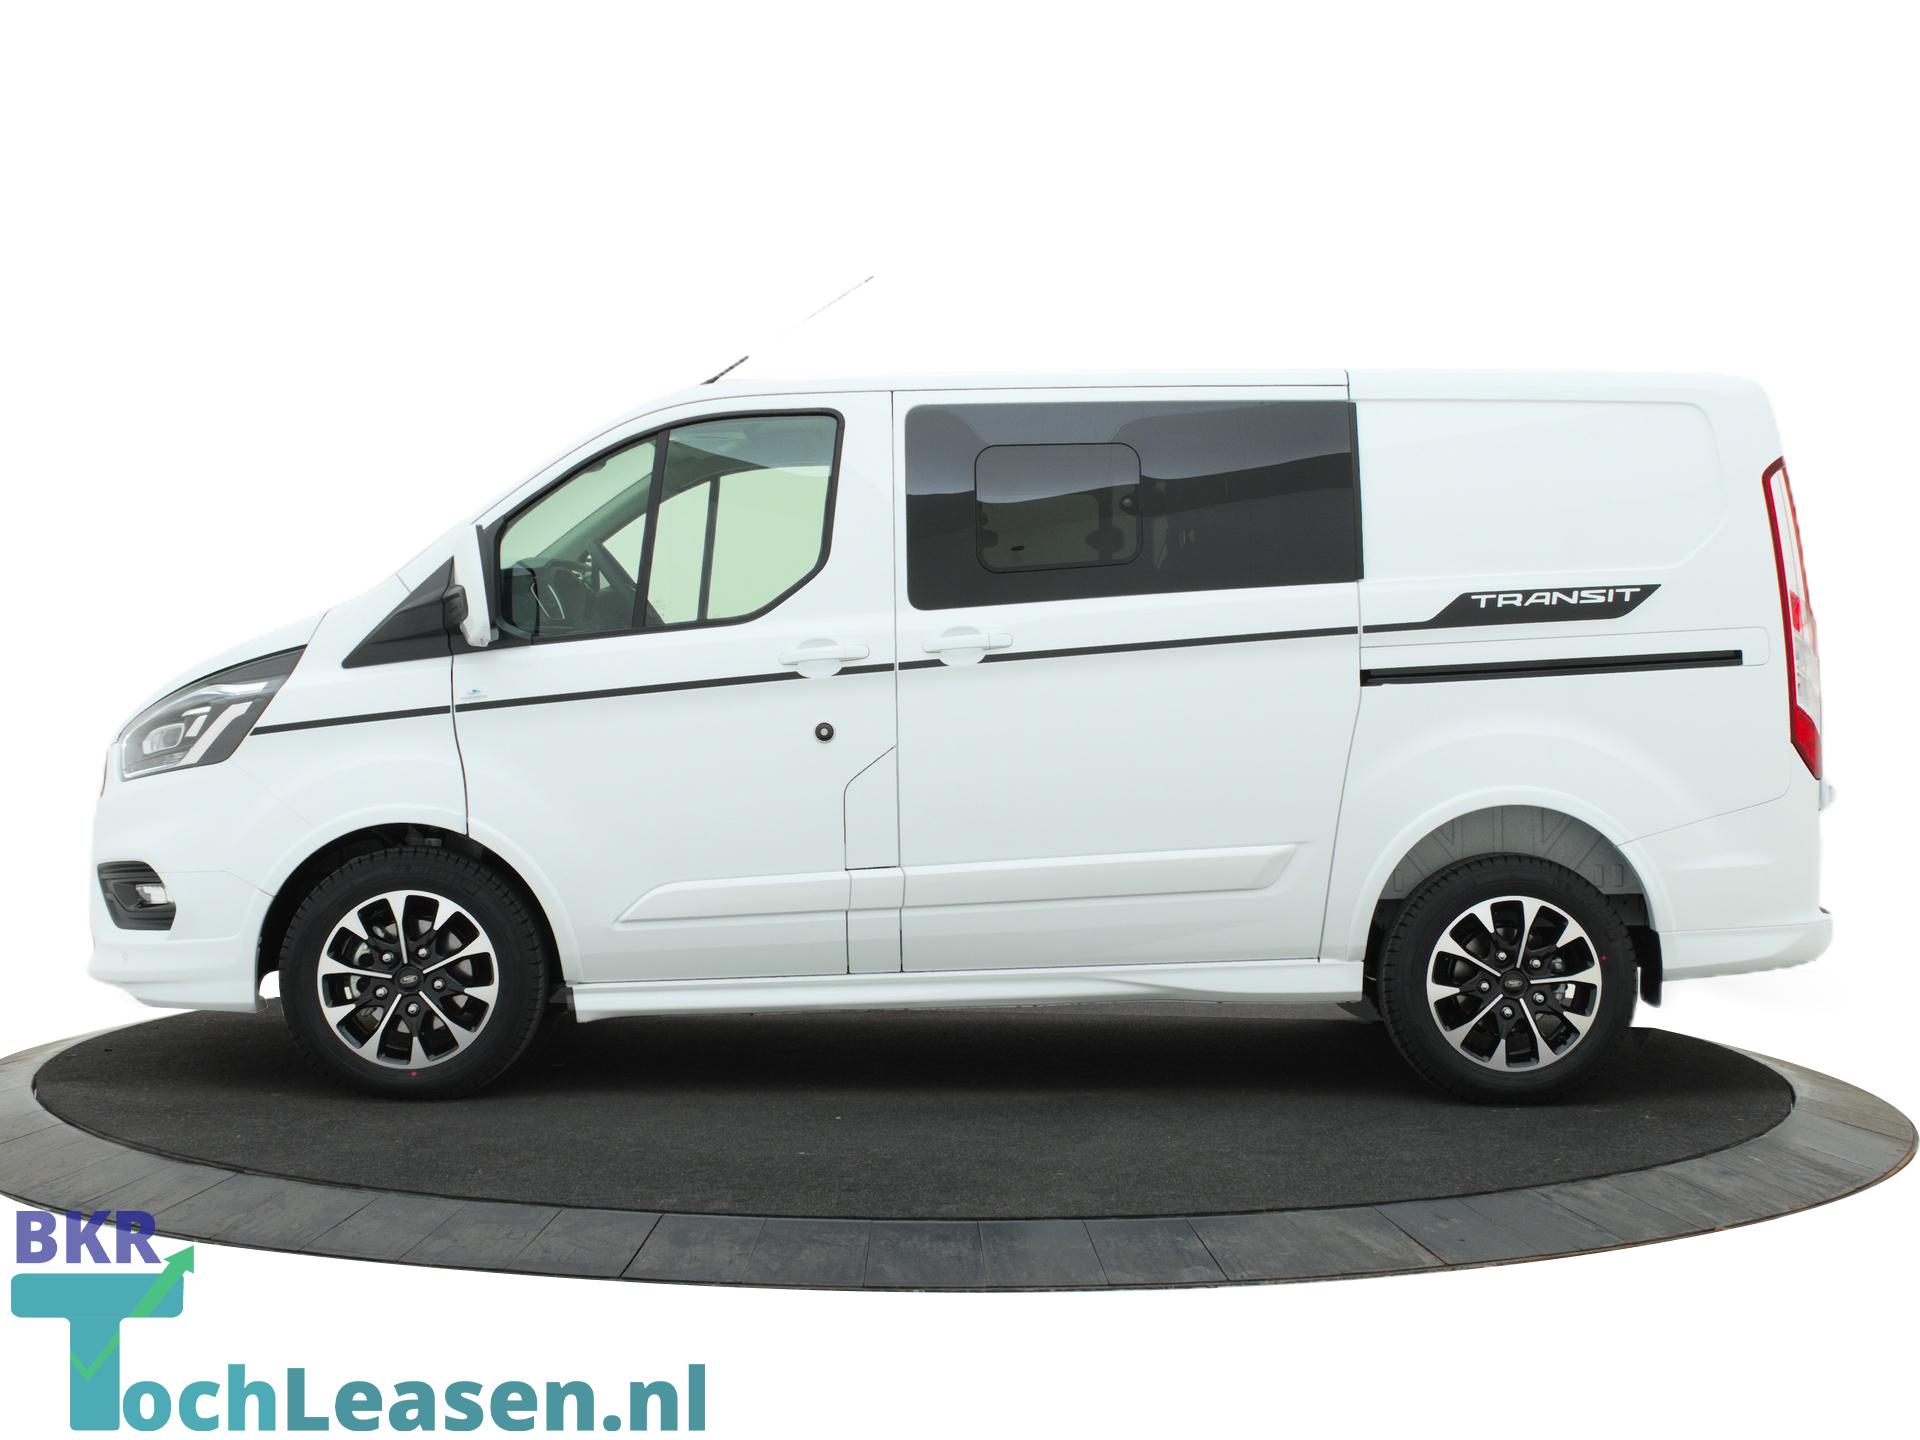 BKRtochleasen.nl - Ford Transit